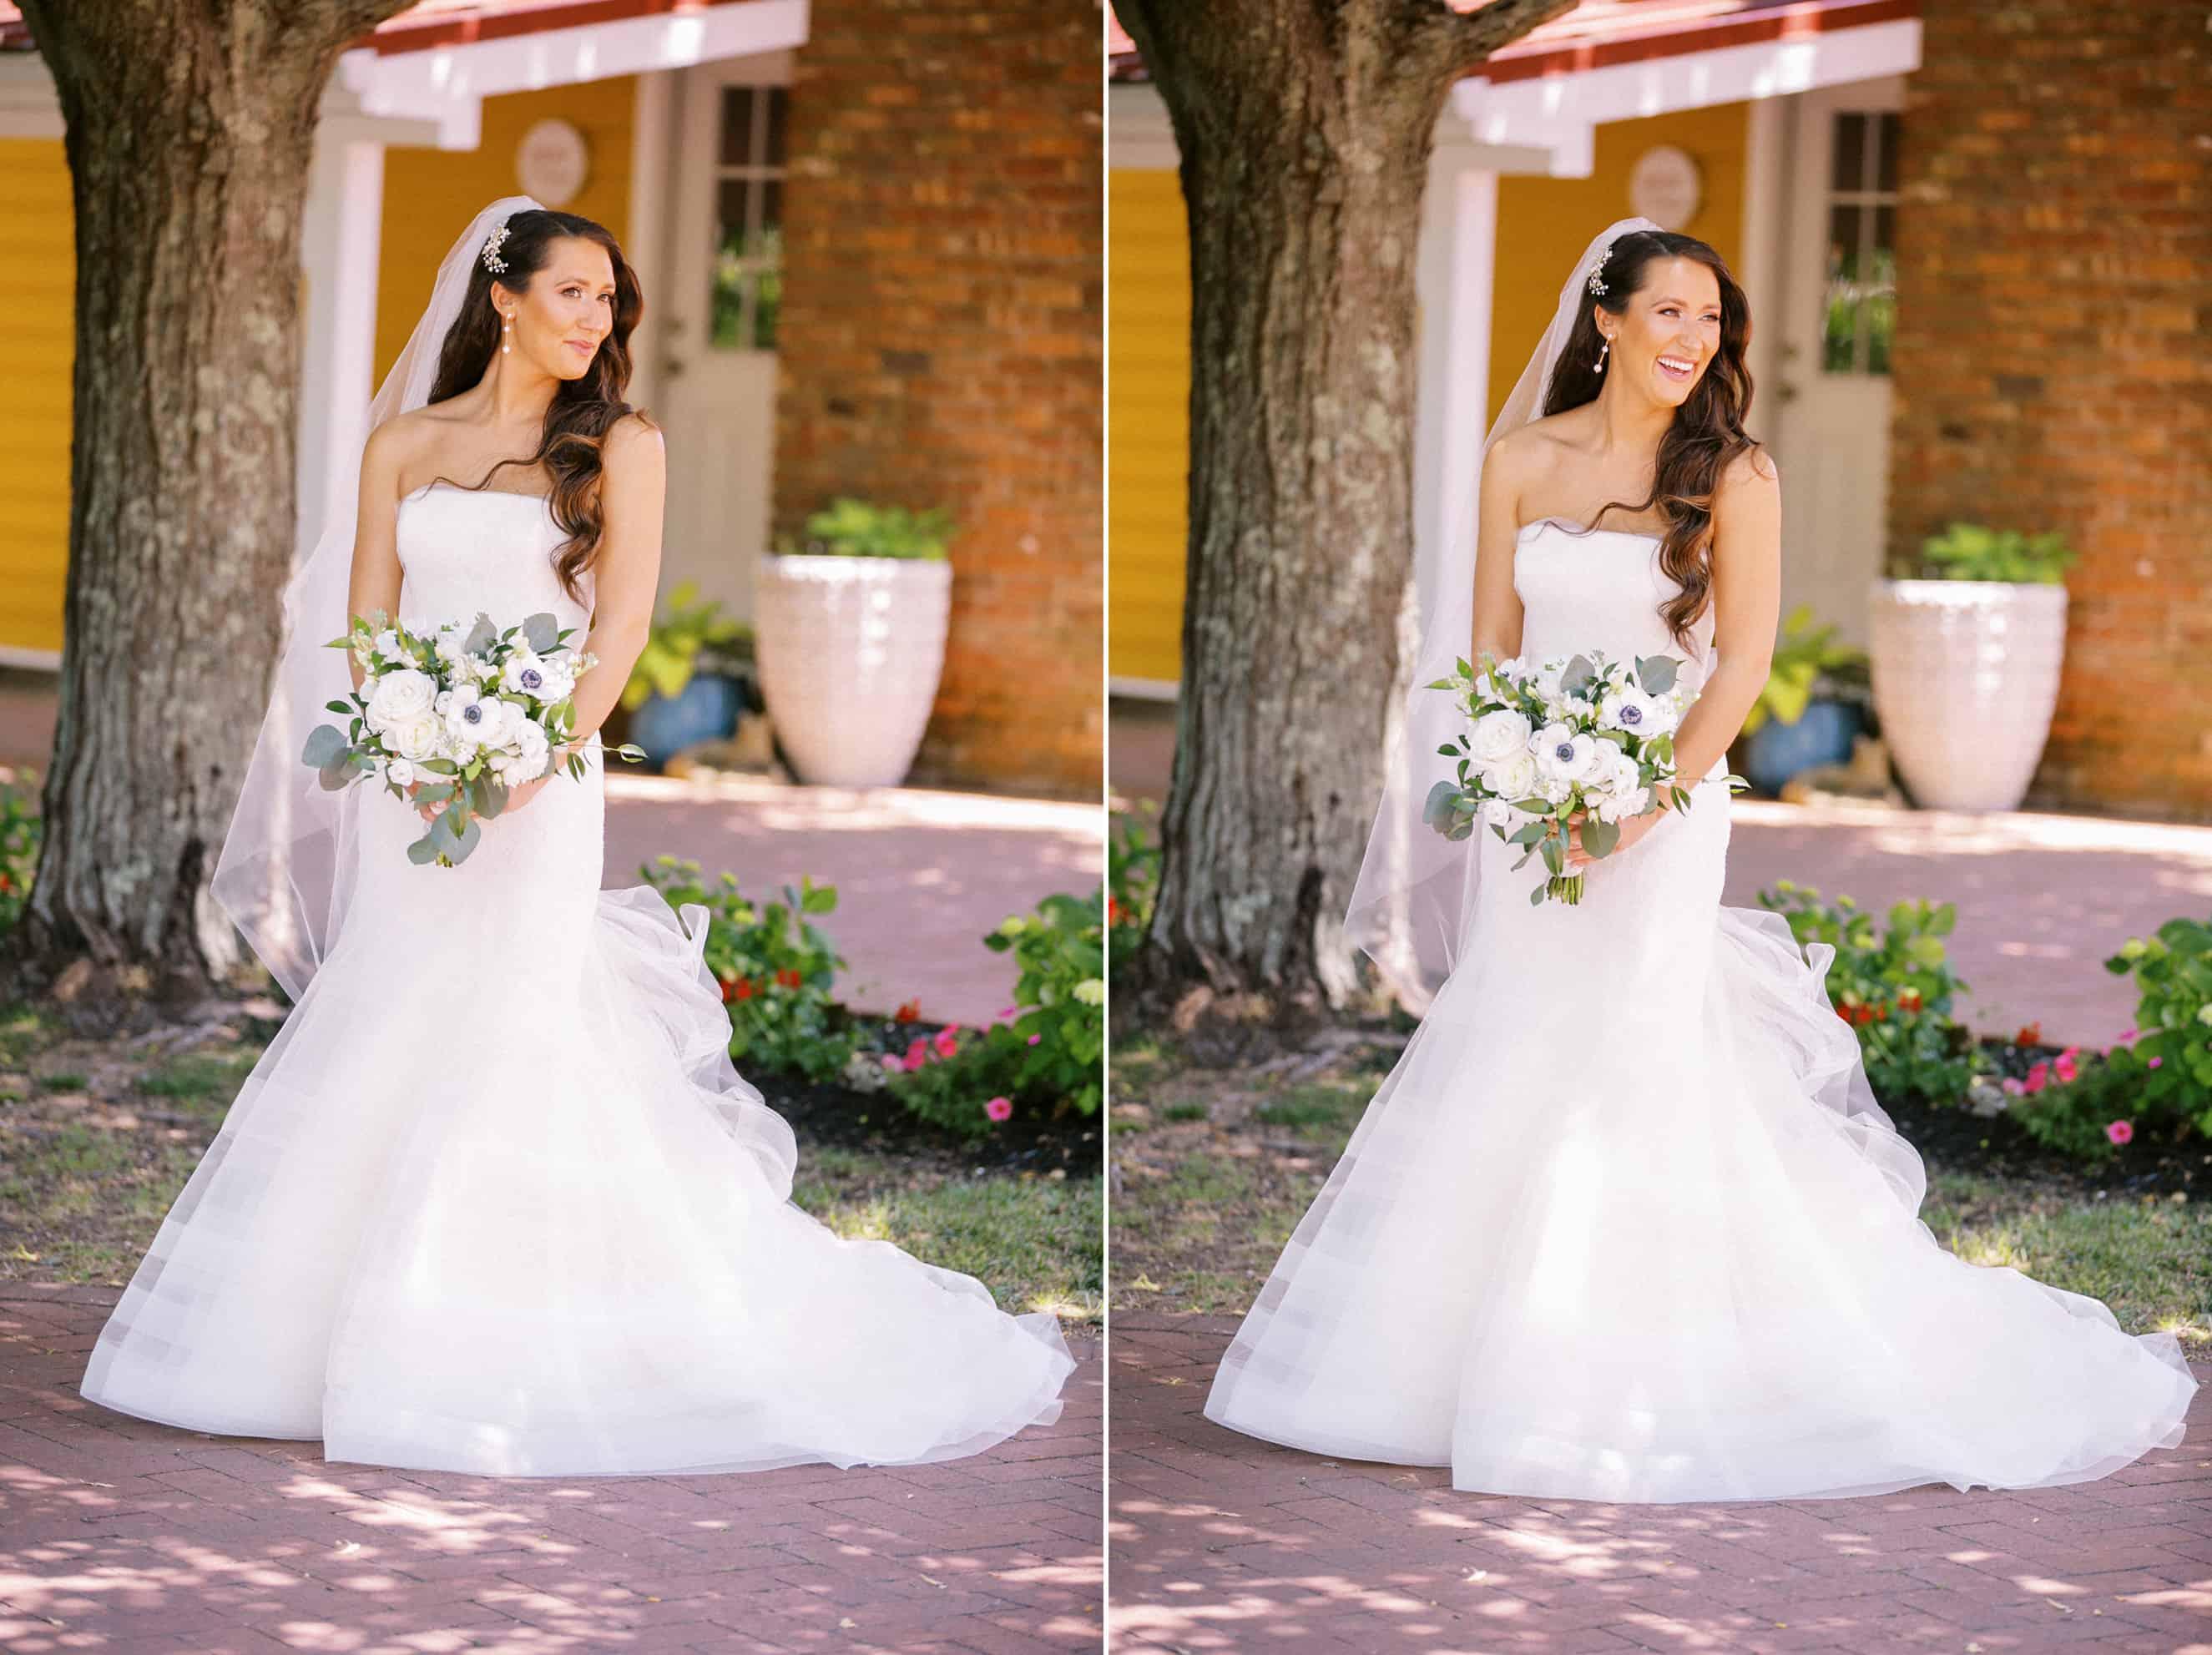 Outdoor Wedding Photos in Cape May